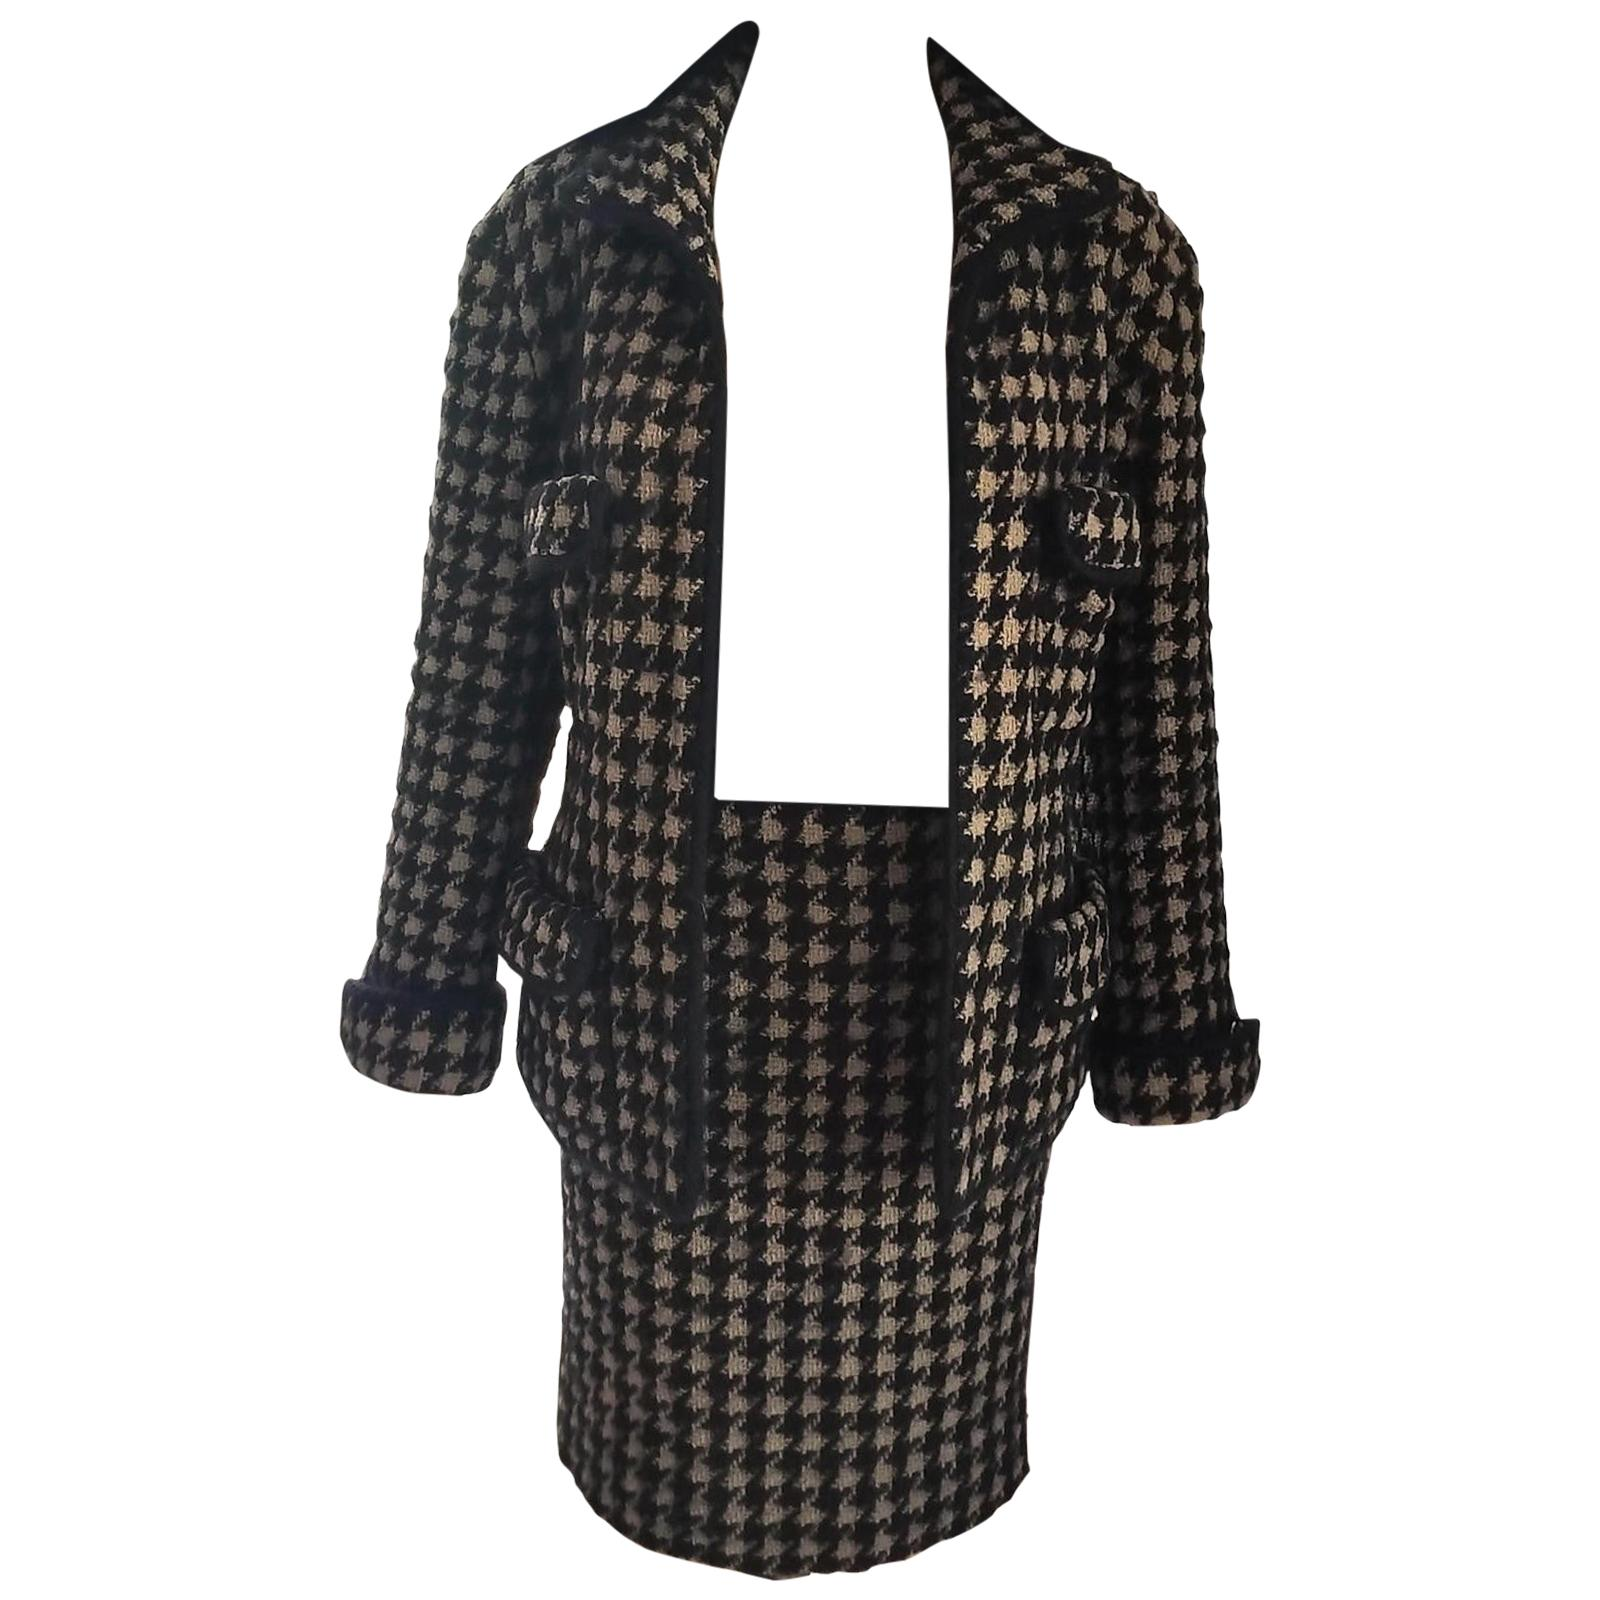 Vintage Chanel 1990's Black & Tan Fantasy Tweed Jacket Skirt Suit FR 40/ US 8